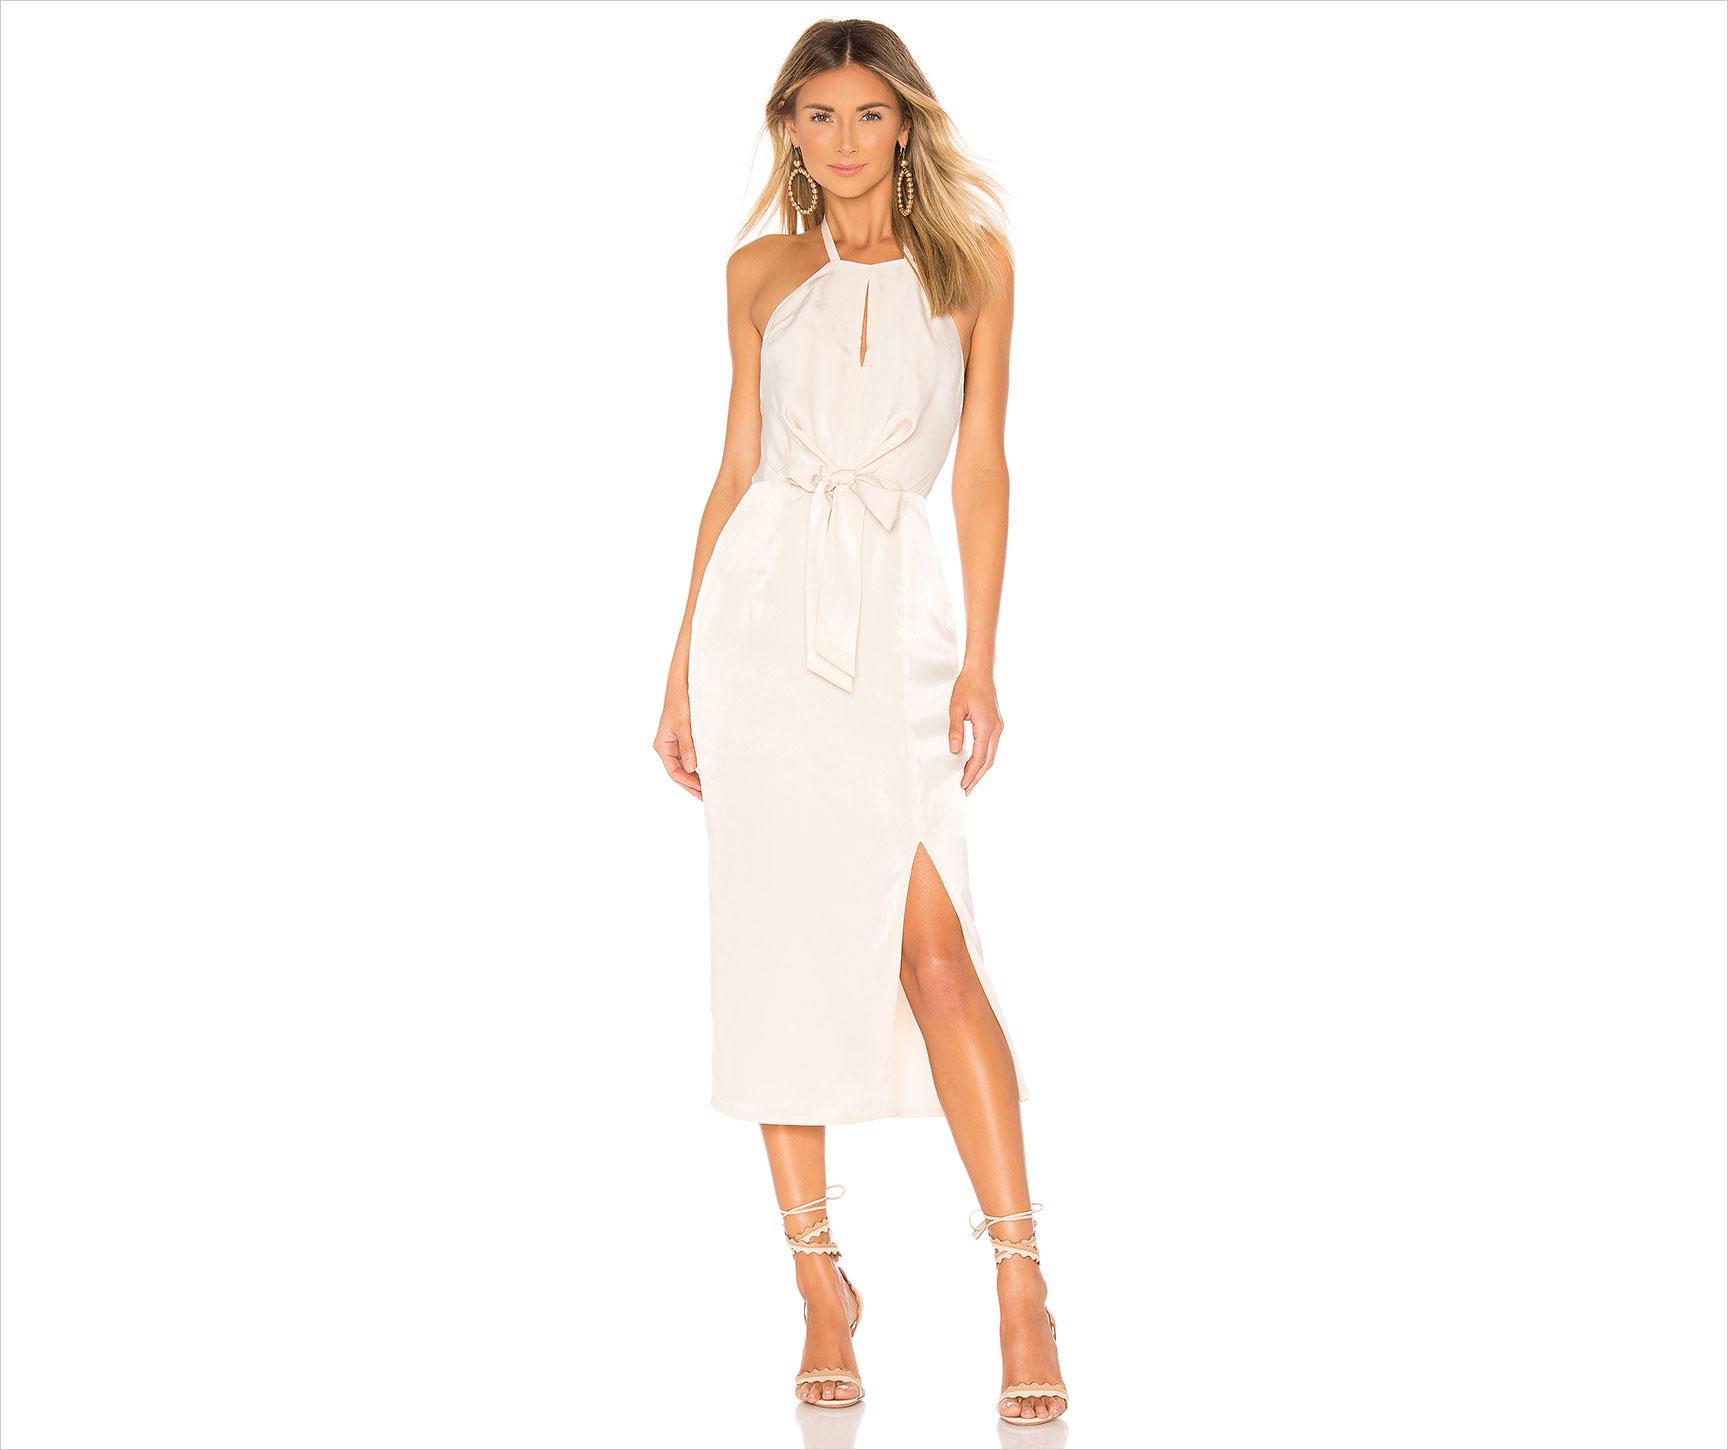 Milo dress X Revolve by House of Harlow bridal shower dress ideas